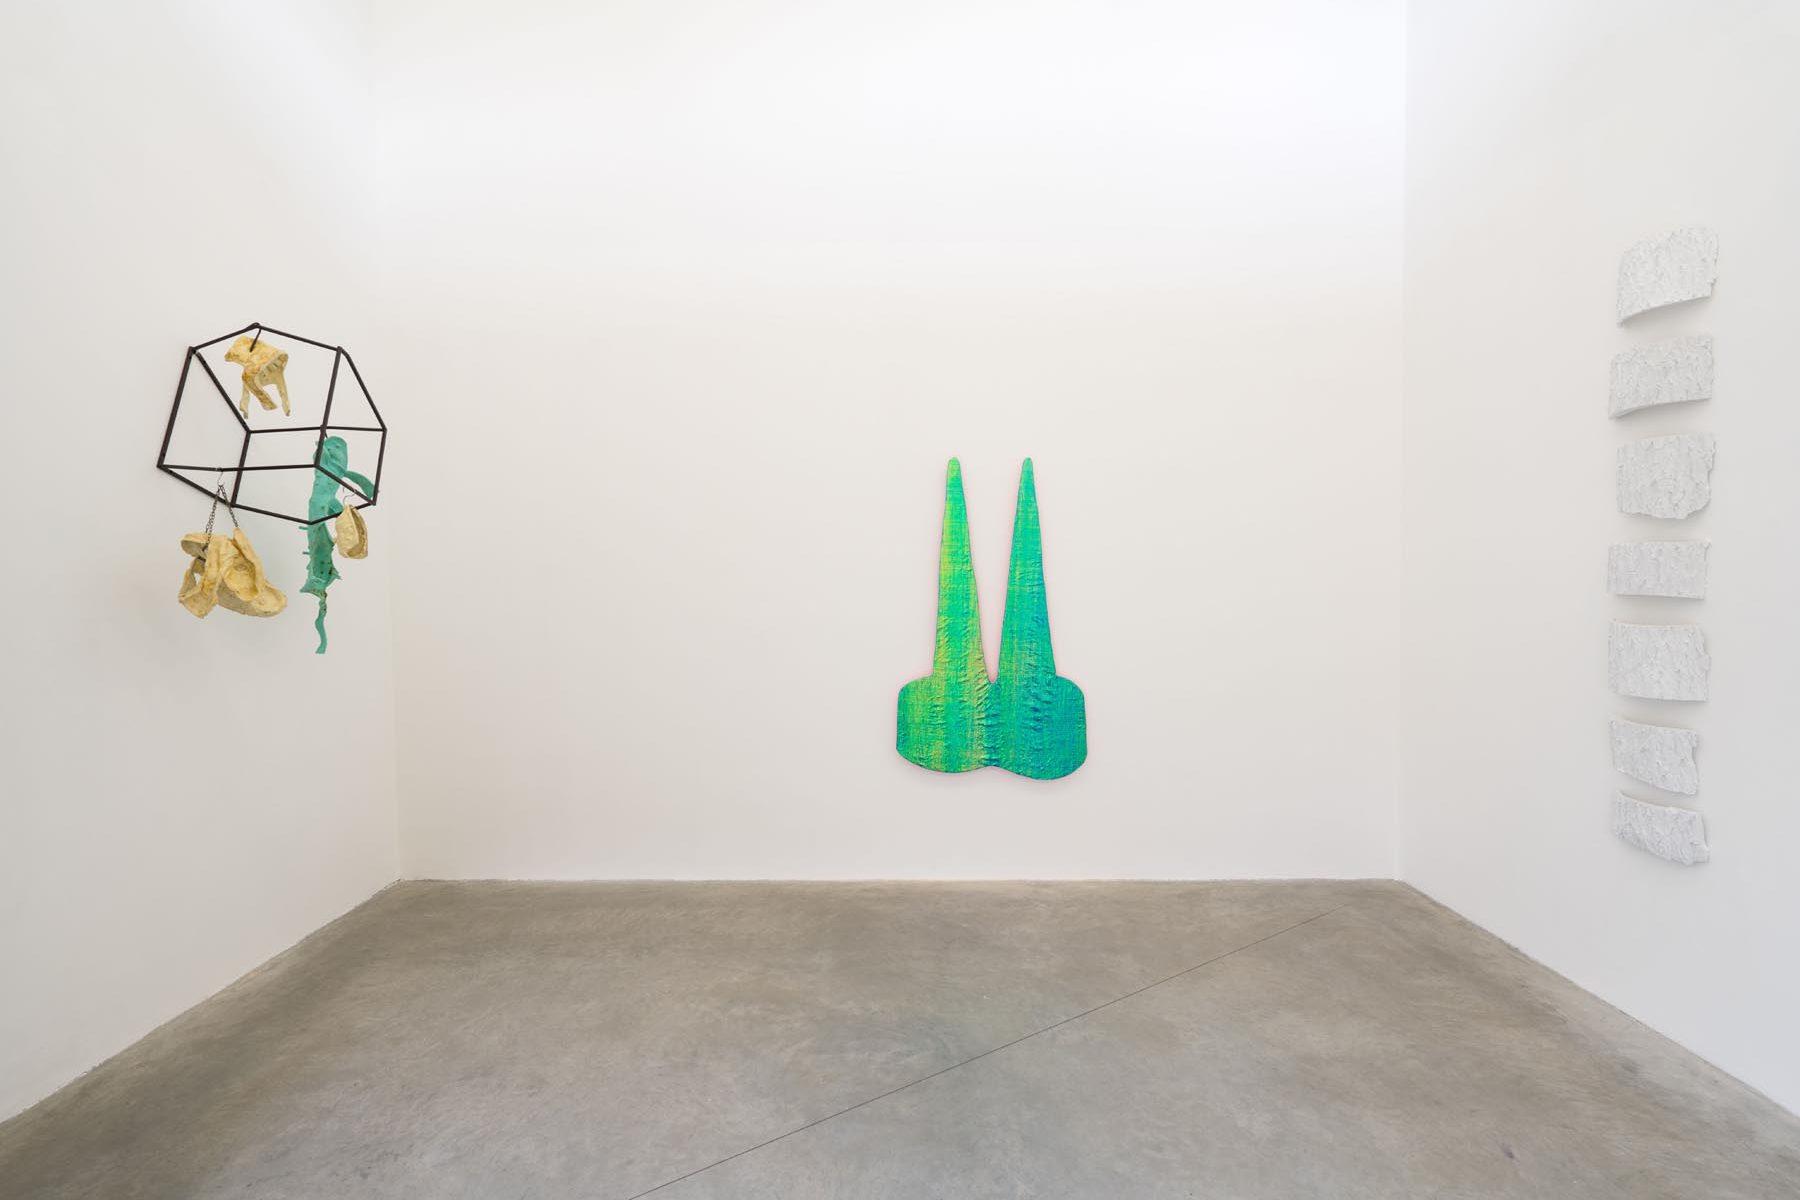 Uroboros, installation view, Galleria Alessandro Albanese, Milan